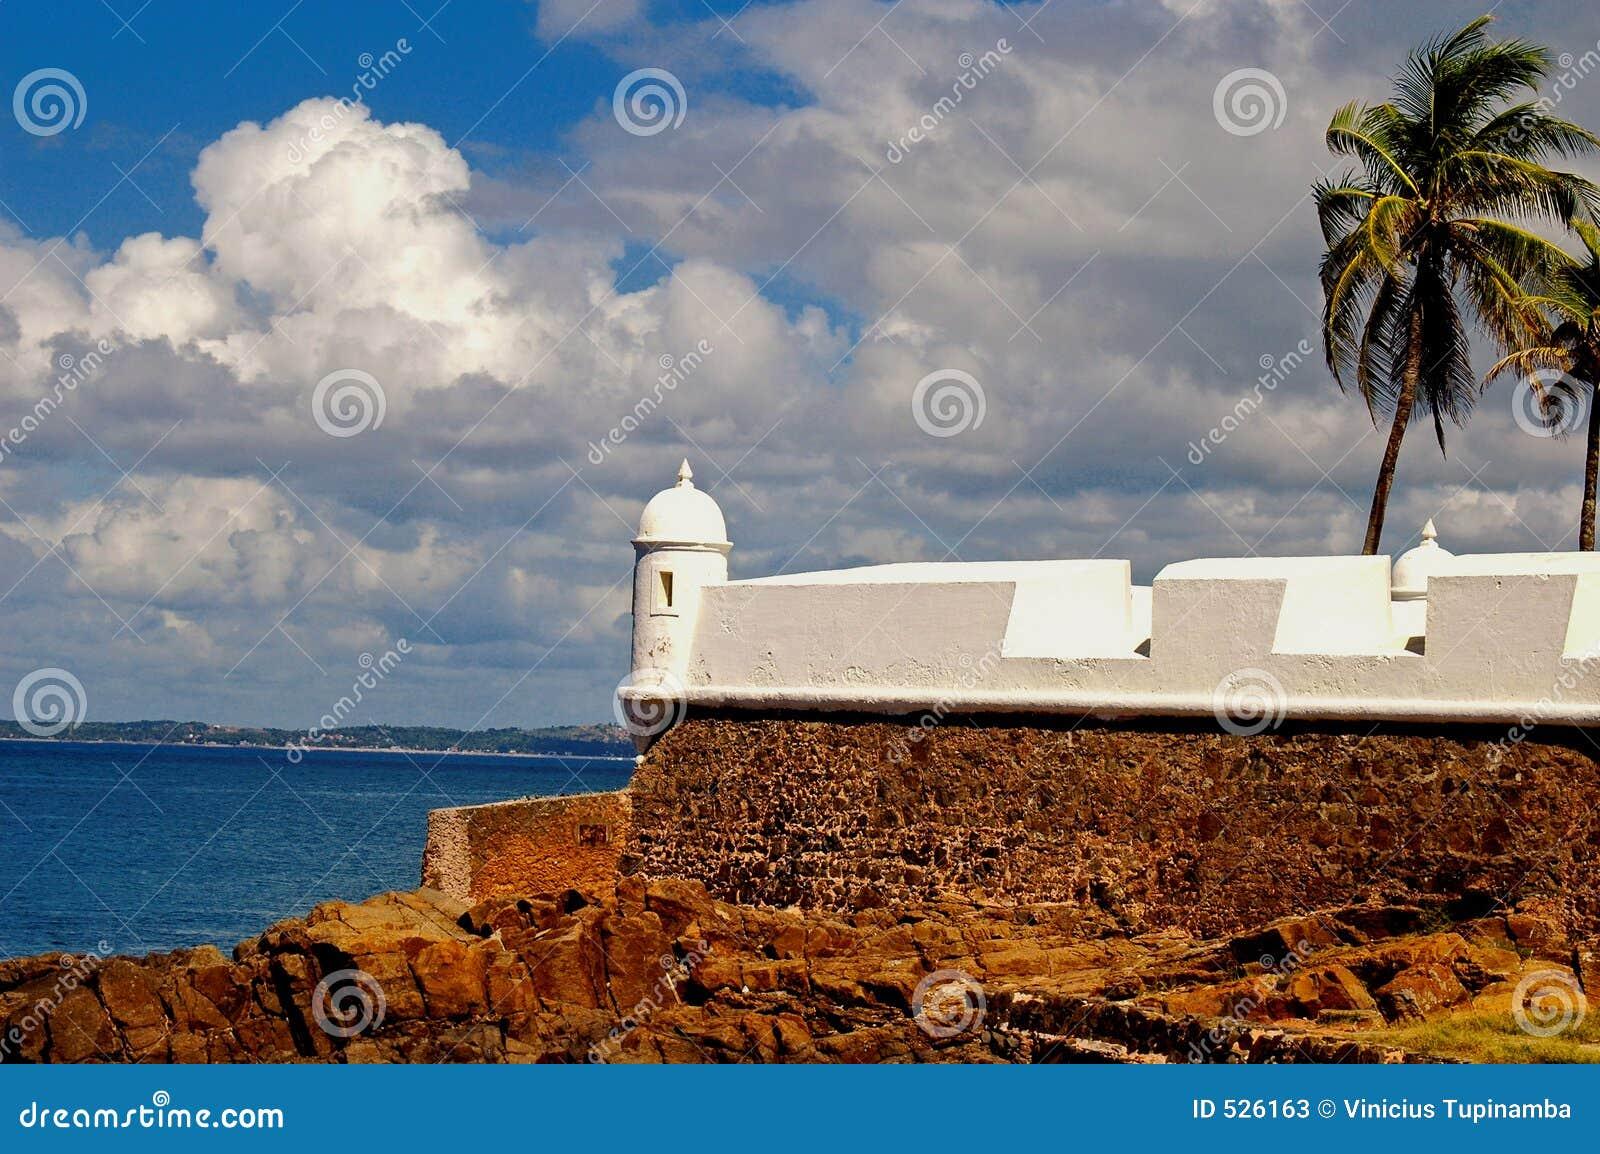 Download 巴伊亚萨尔瓦多 库存图片. 图片 包括有 云彩, 有历史, 旅行, 长处, 筑堡垒于, 海运, 灯塔, 纪念碑 - 526163